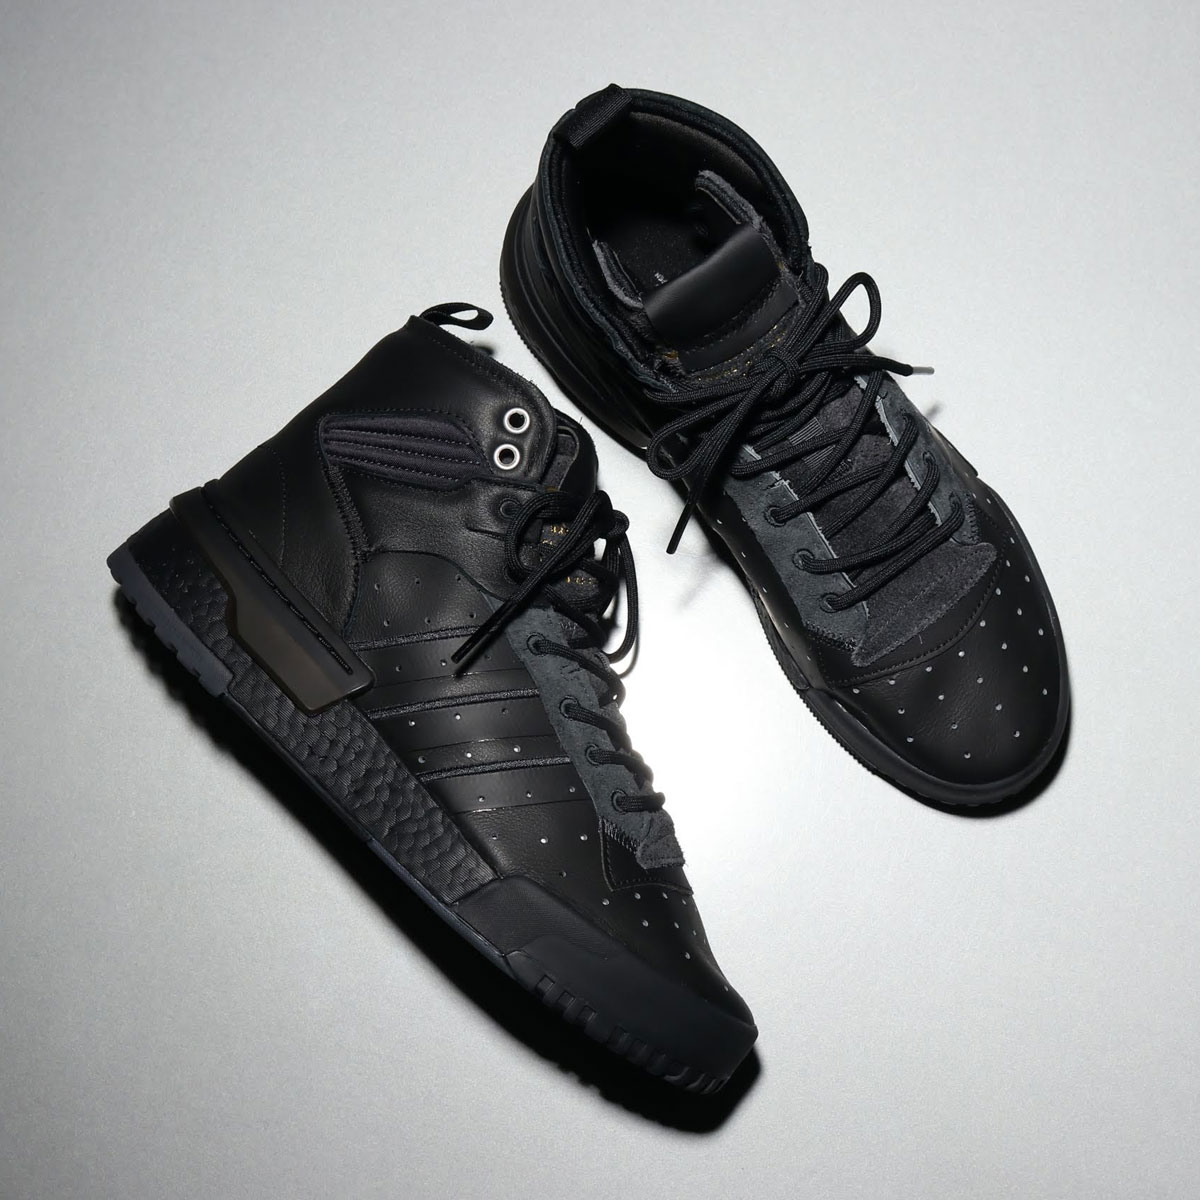 adidas Originals RIVLRY RM(アディダスオリジナルス ライバルリー RM)CORE BLACK/CARBON/GREY SIX【メンズ レディース スニーカー】19SS-I